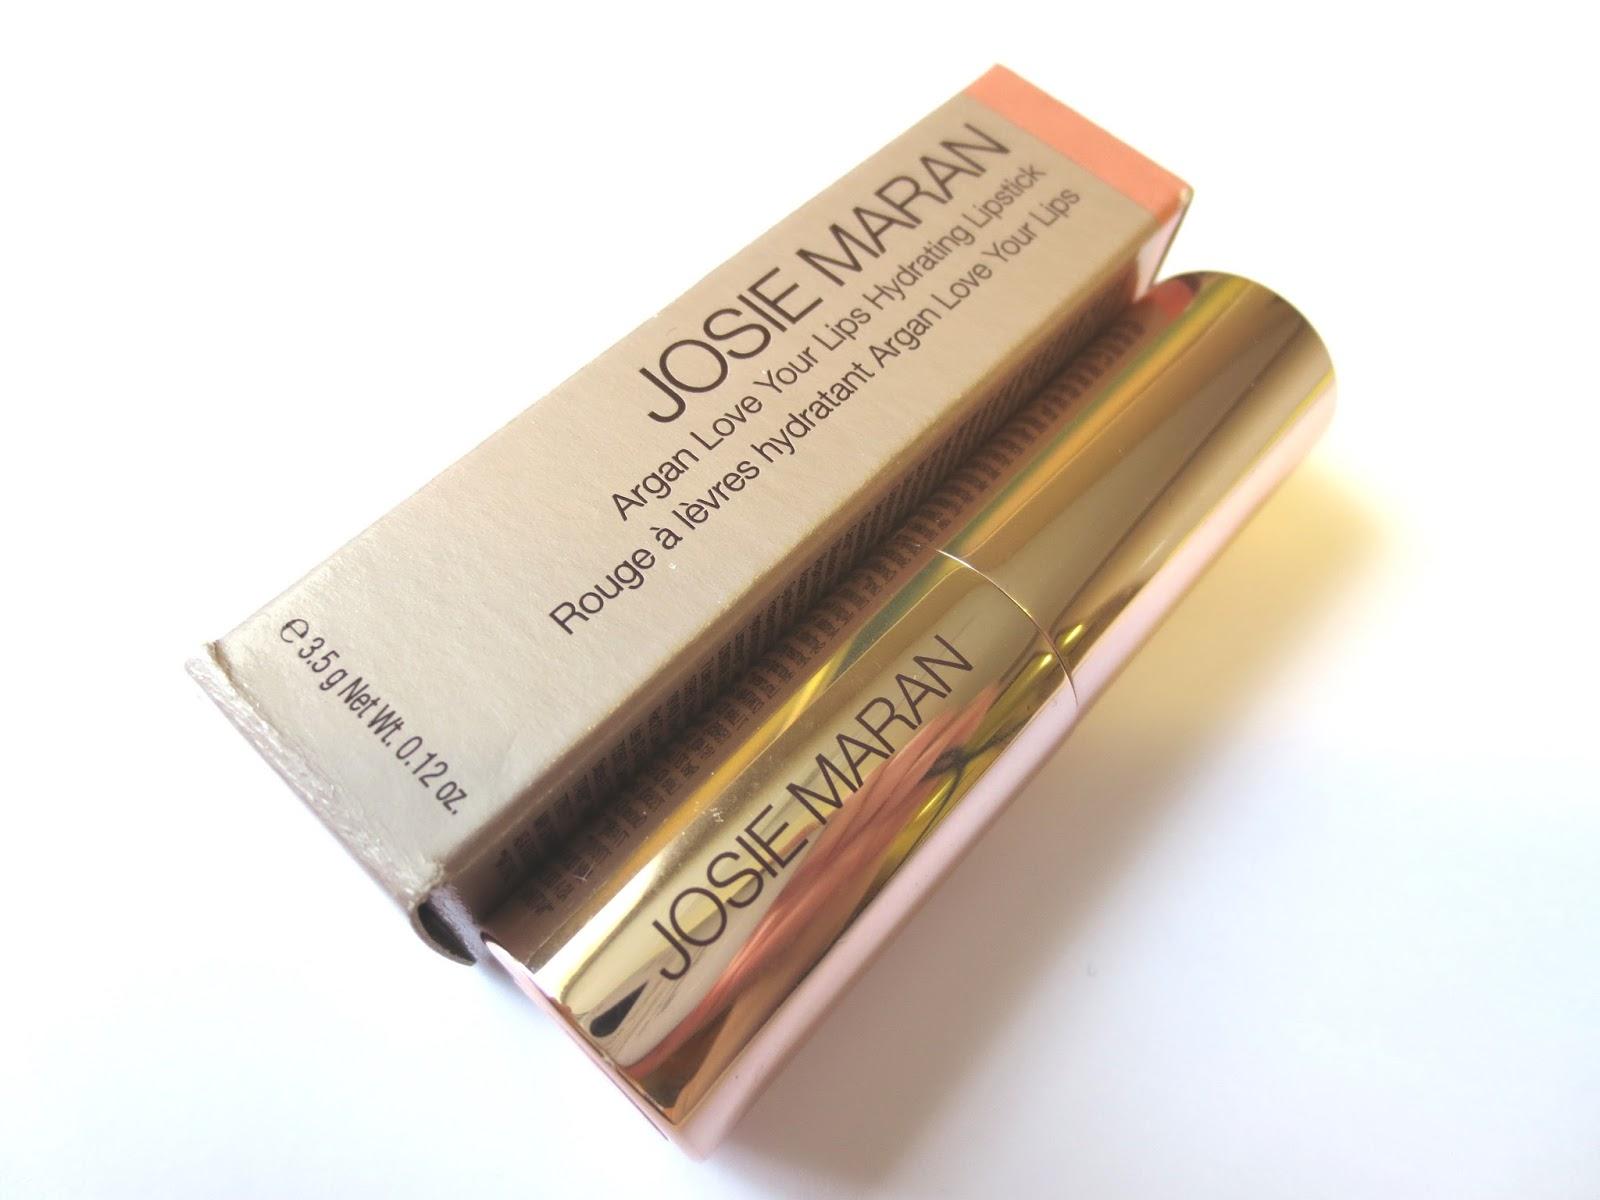 Josie Maran Cosmetics Organic Argan Oil Color Stick In Petal Pink Love This Esp The Dry Cold Months